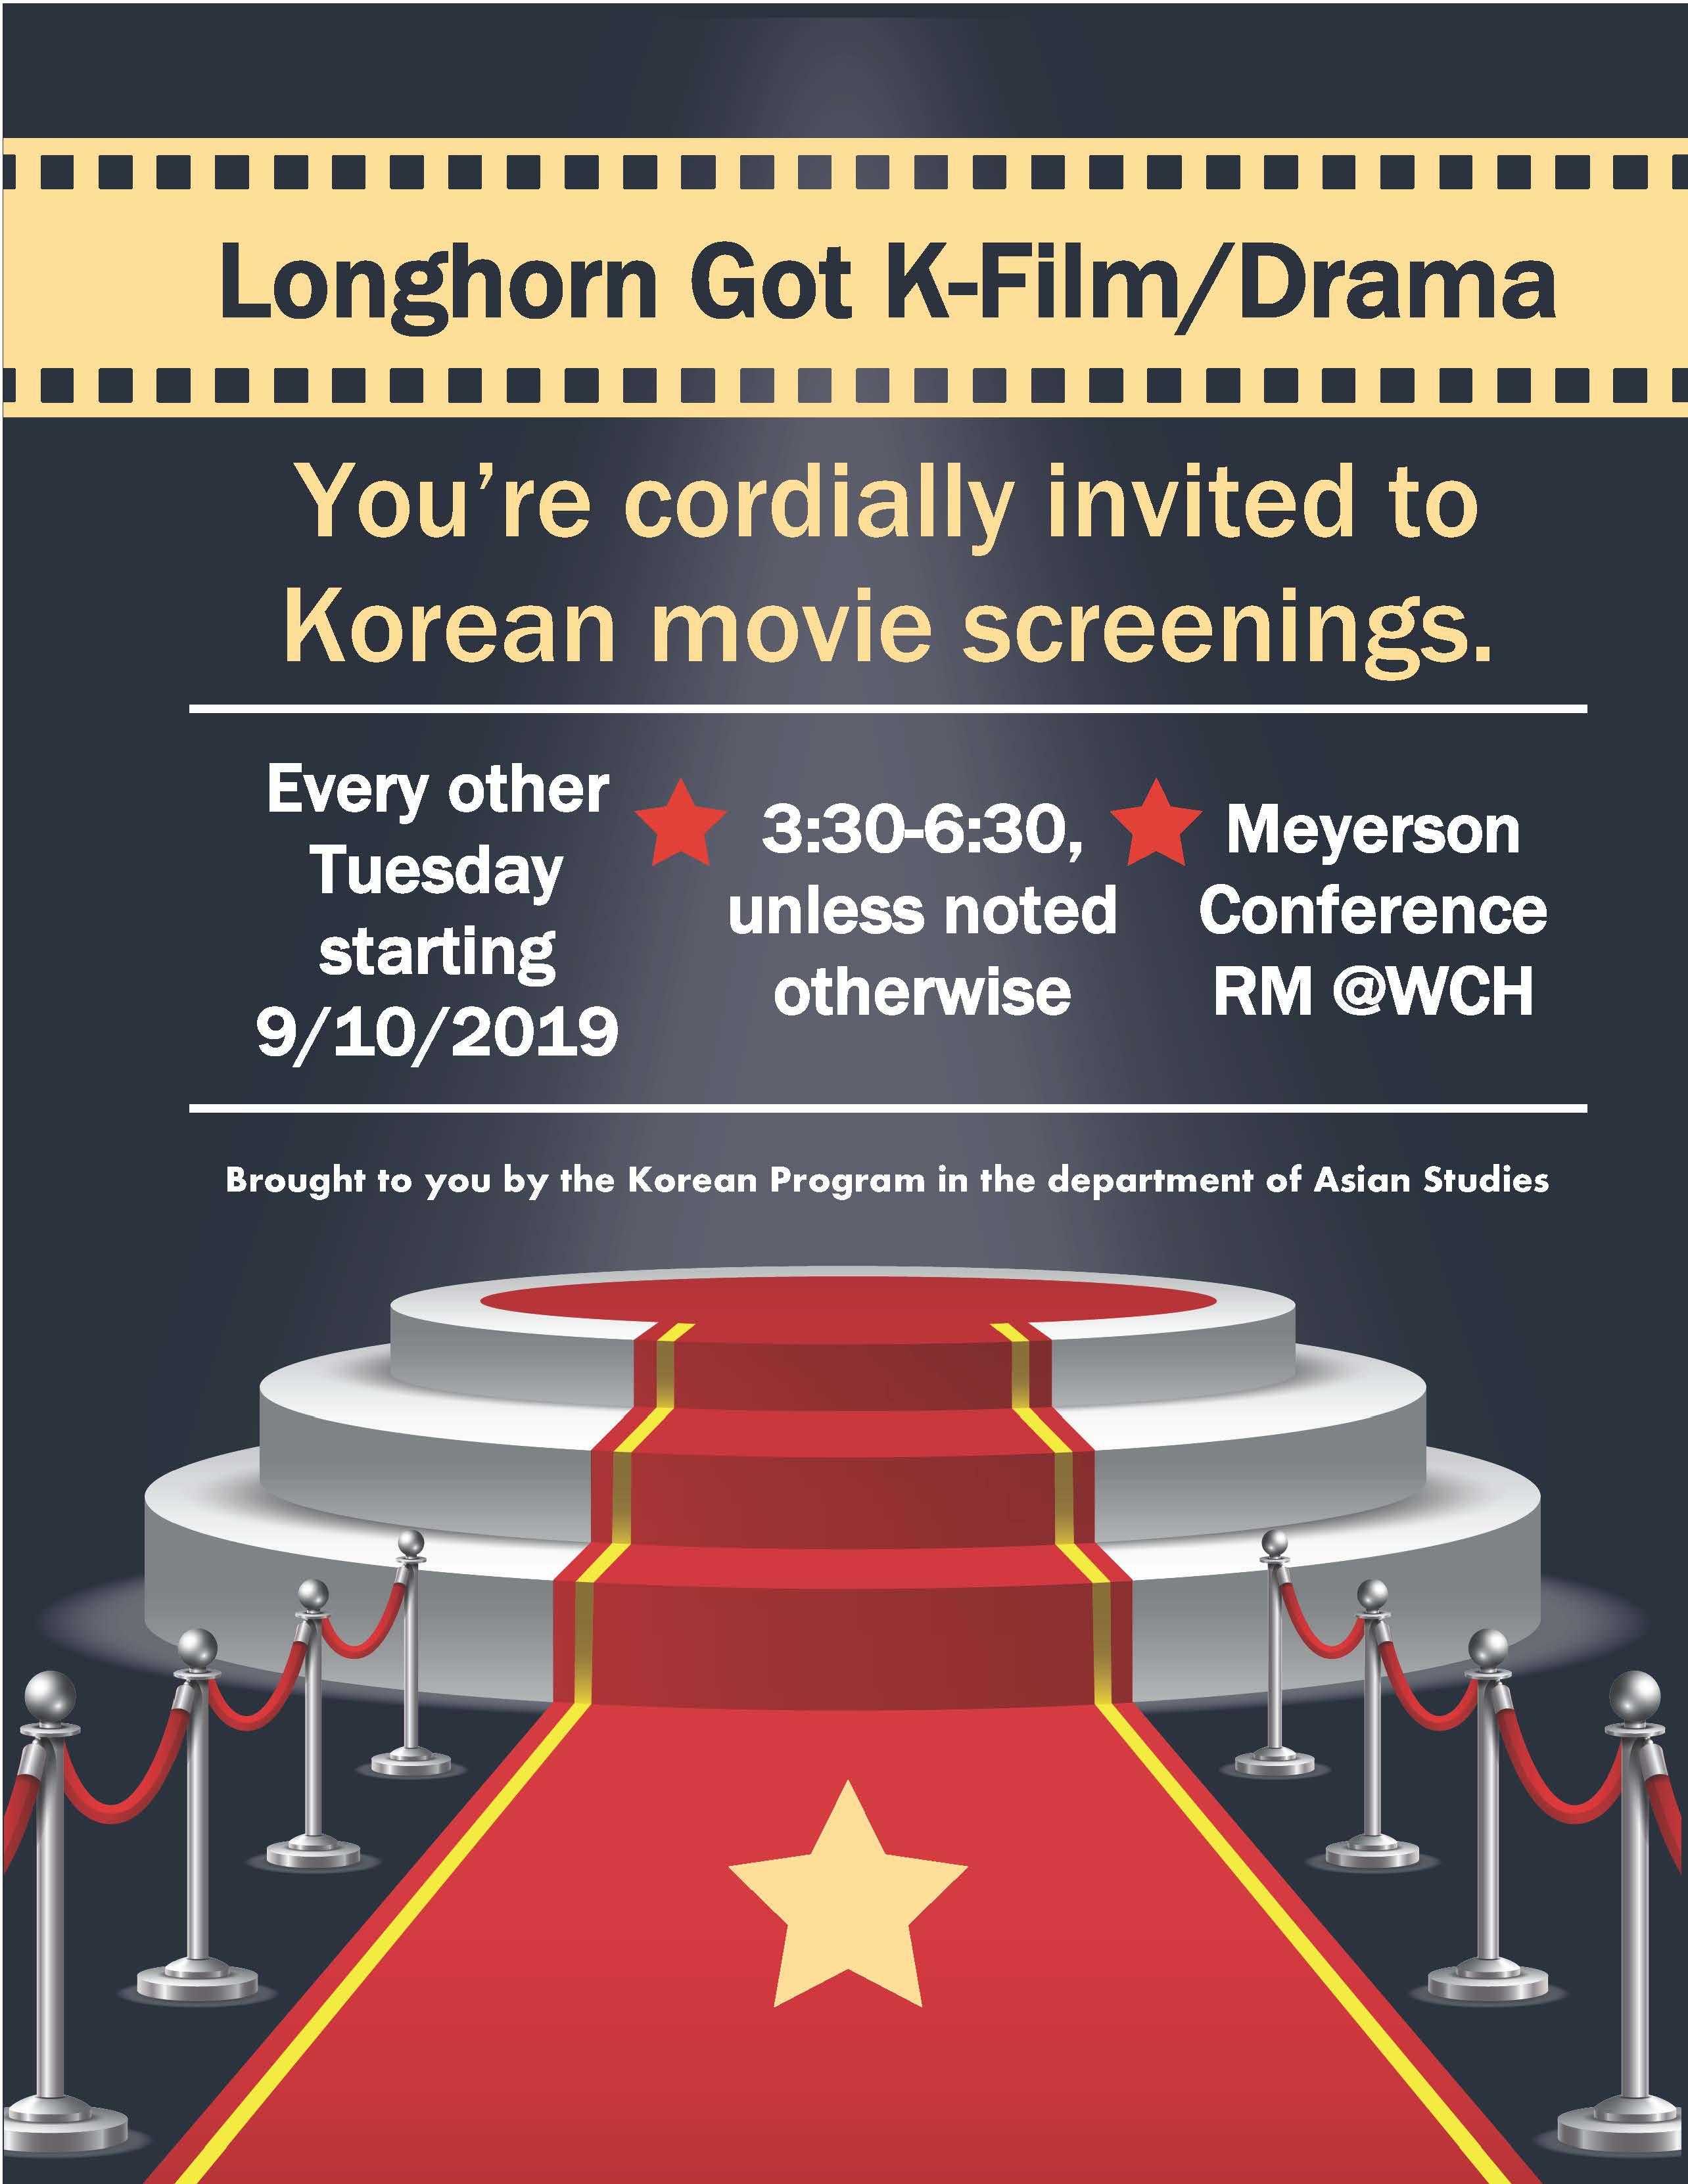 Longhorn Got K-Film/Drama